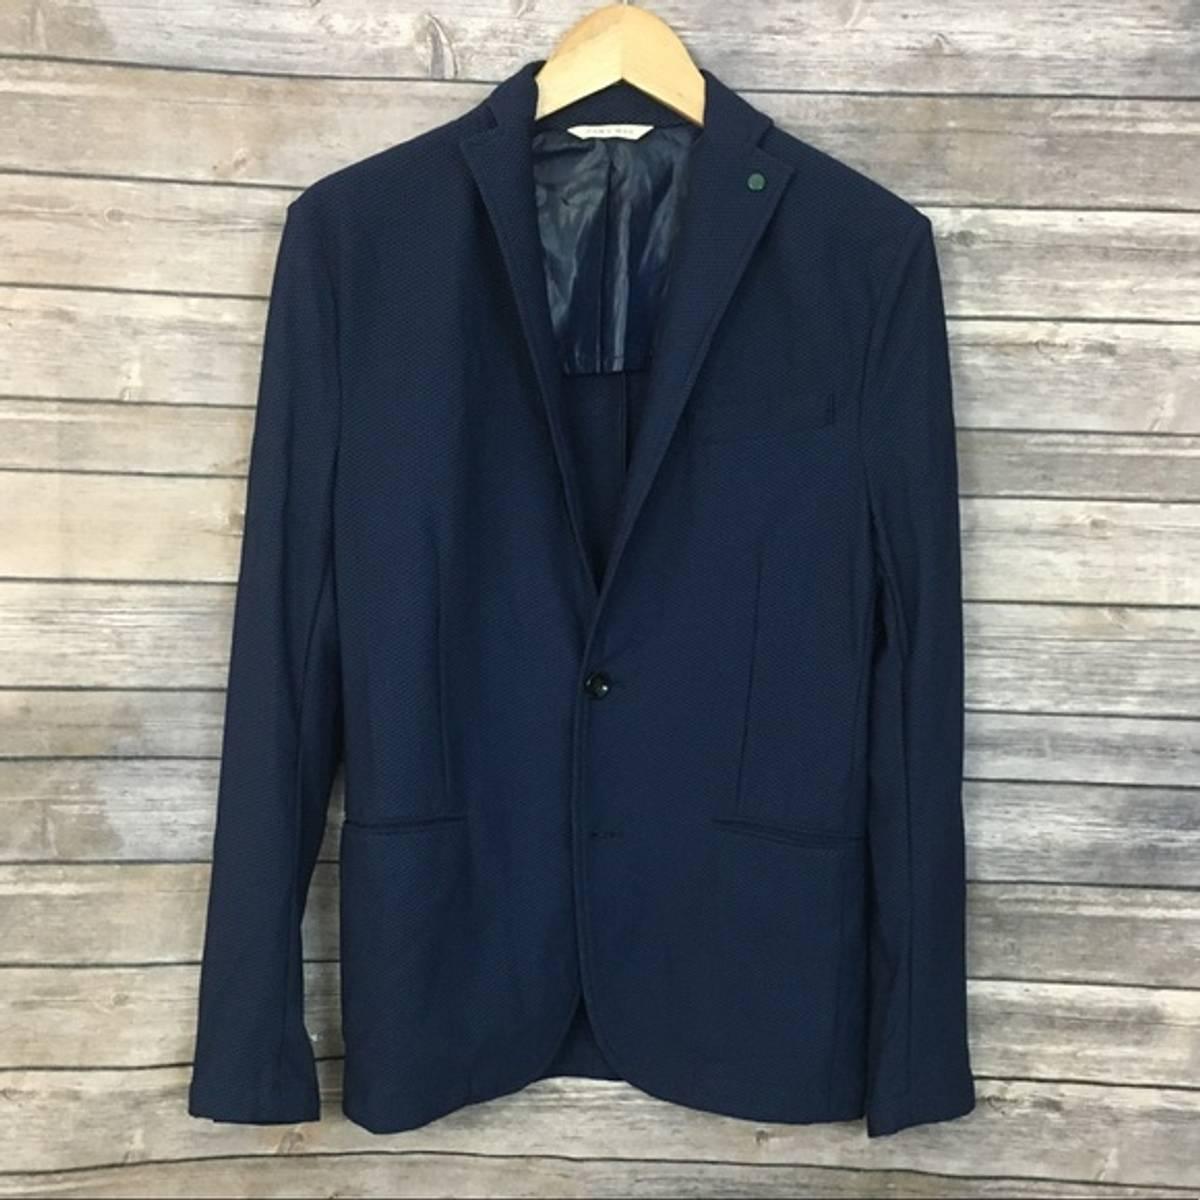 Zara Zara Man Navy Blue Blazer Grailed